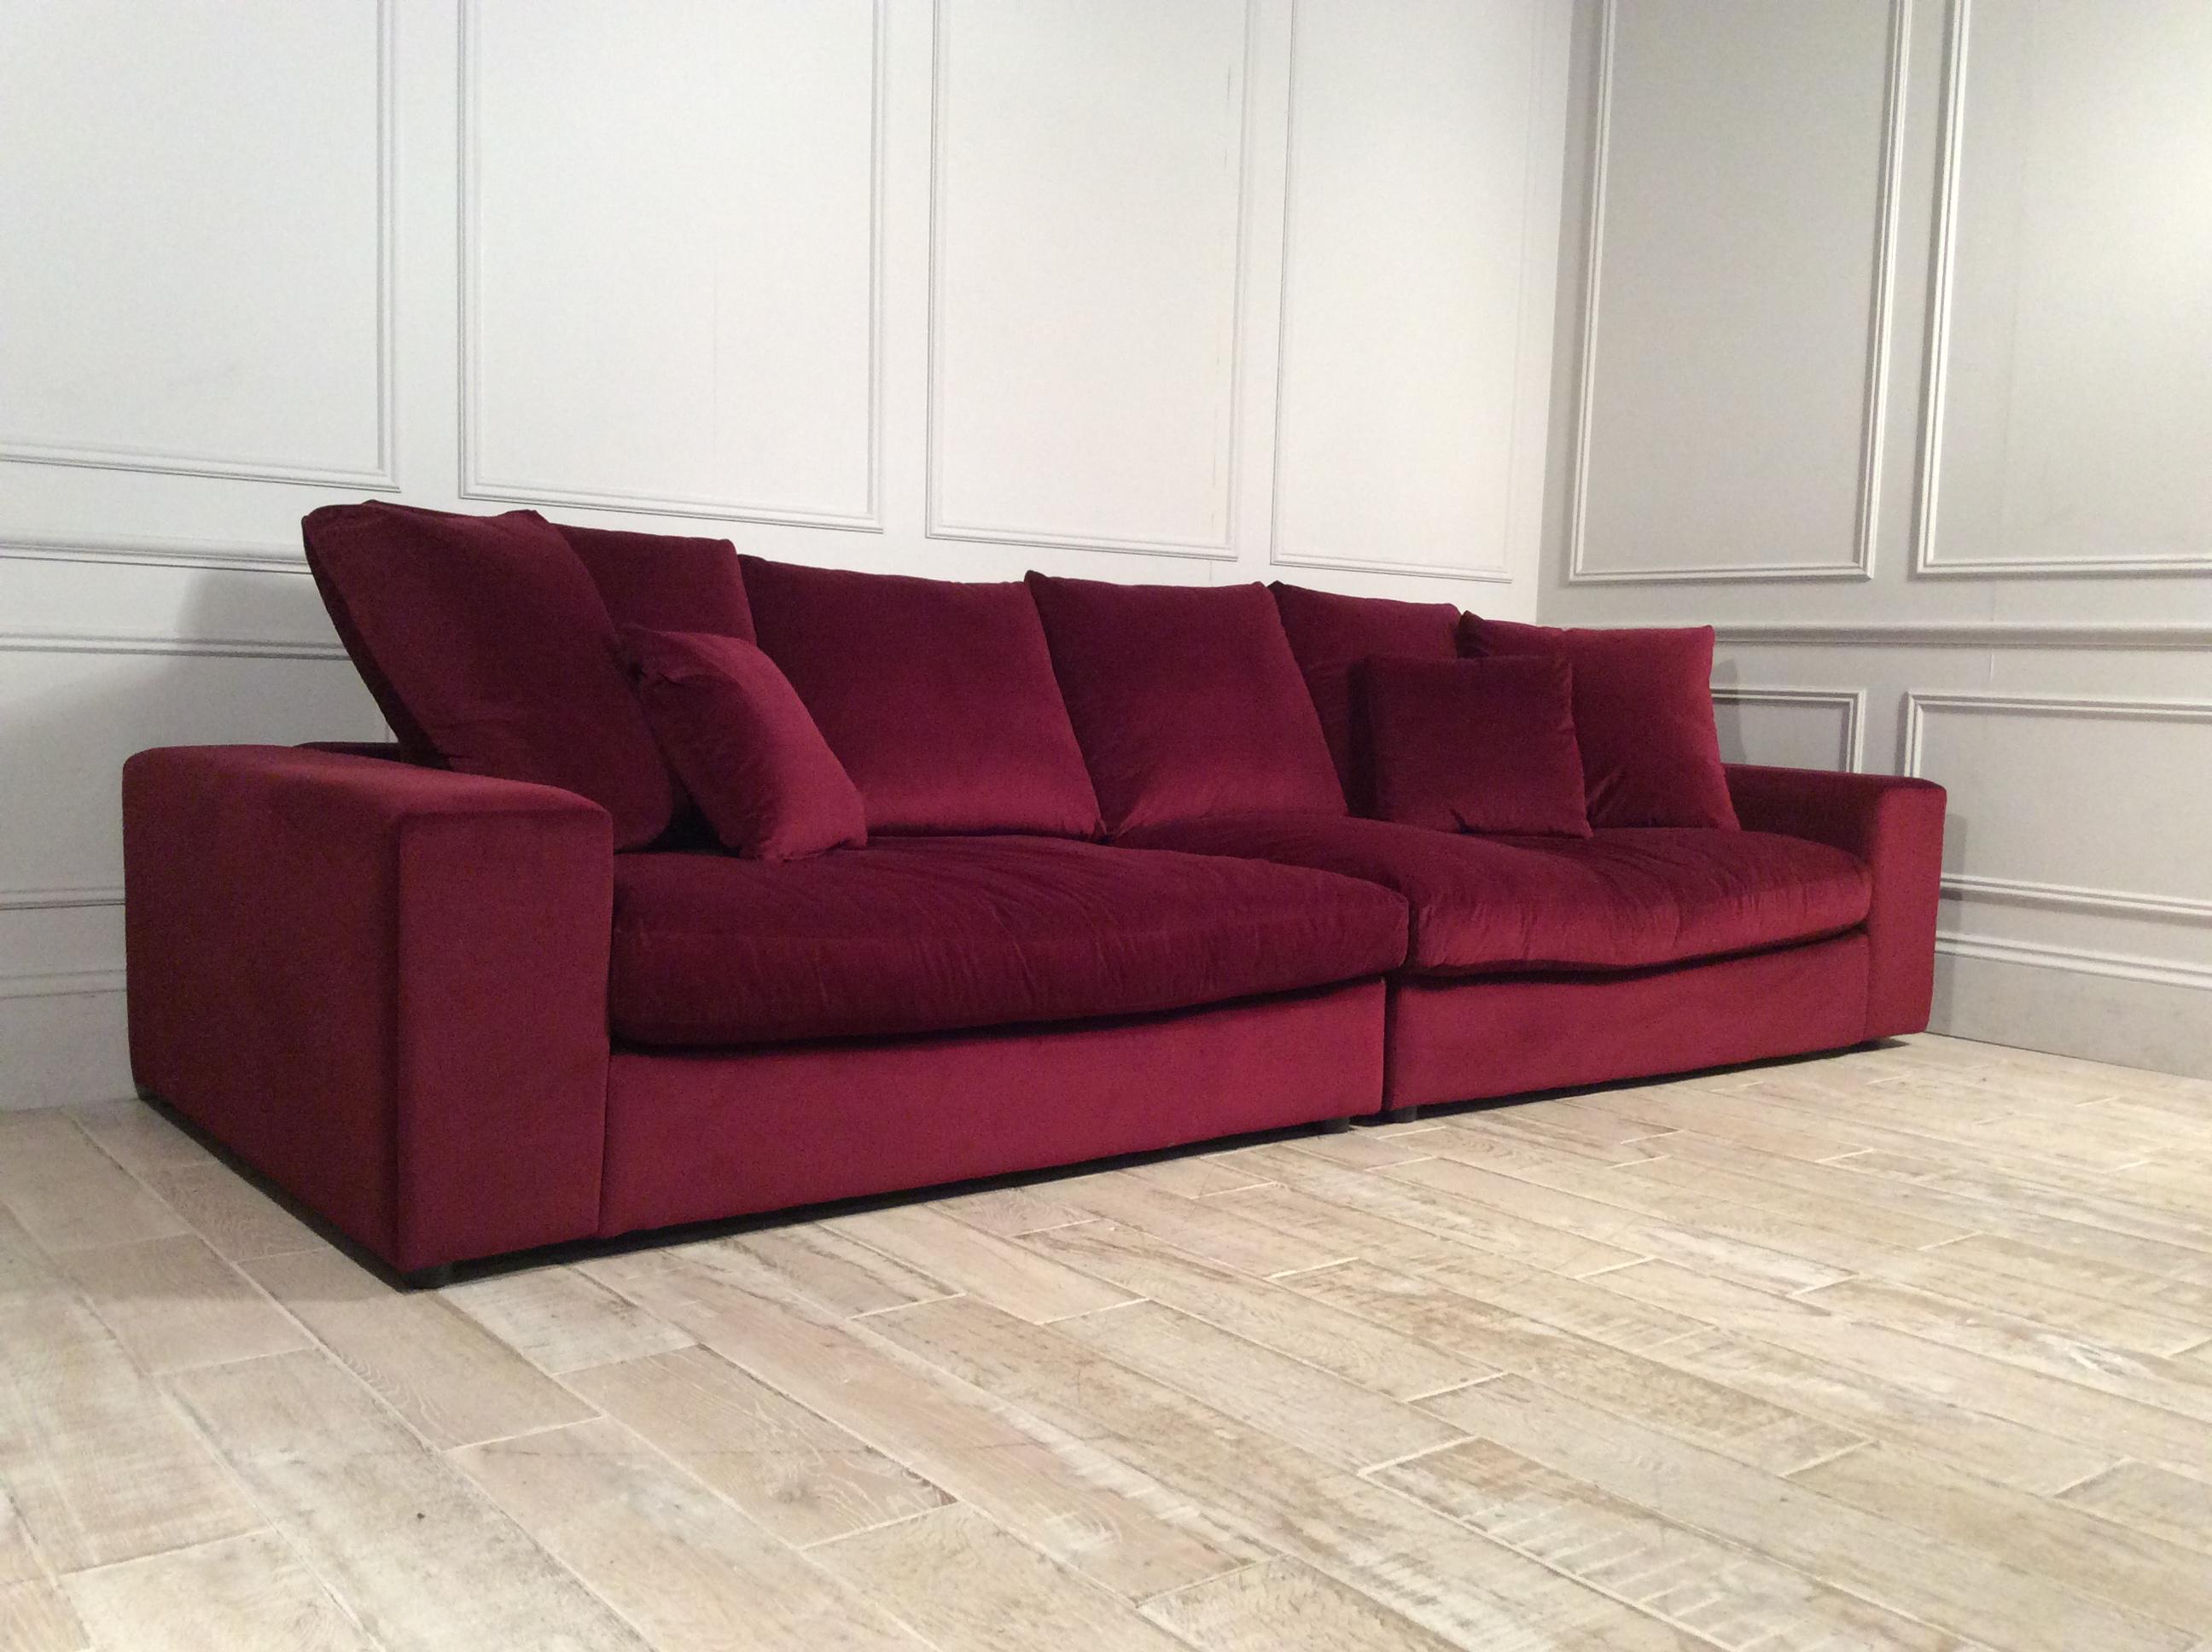 Haymarket Extra Deep 5 Seater Fabric Sofa in Merlot